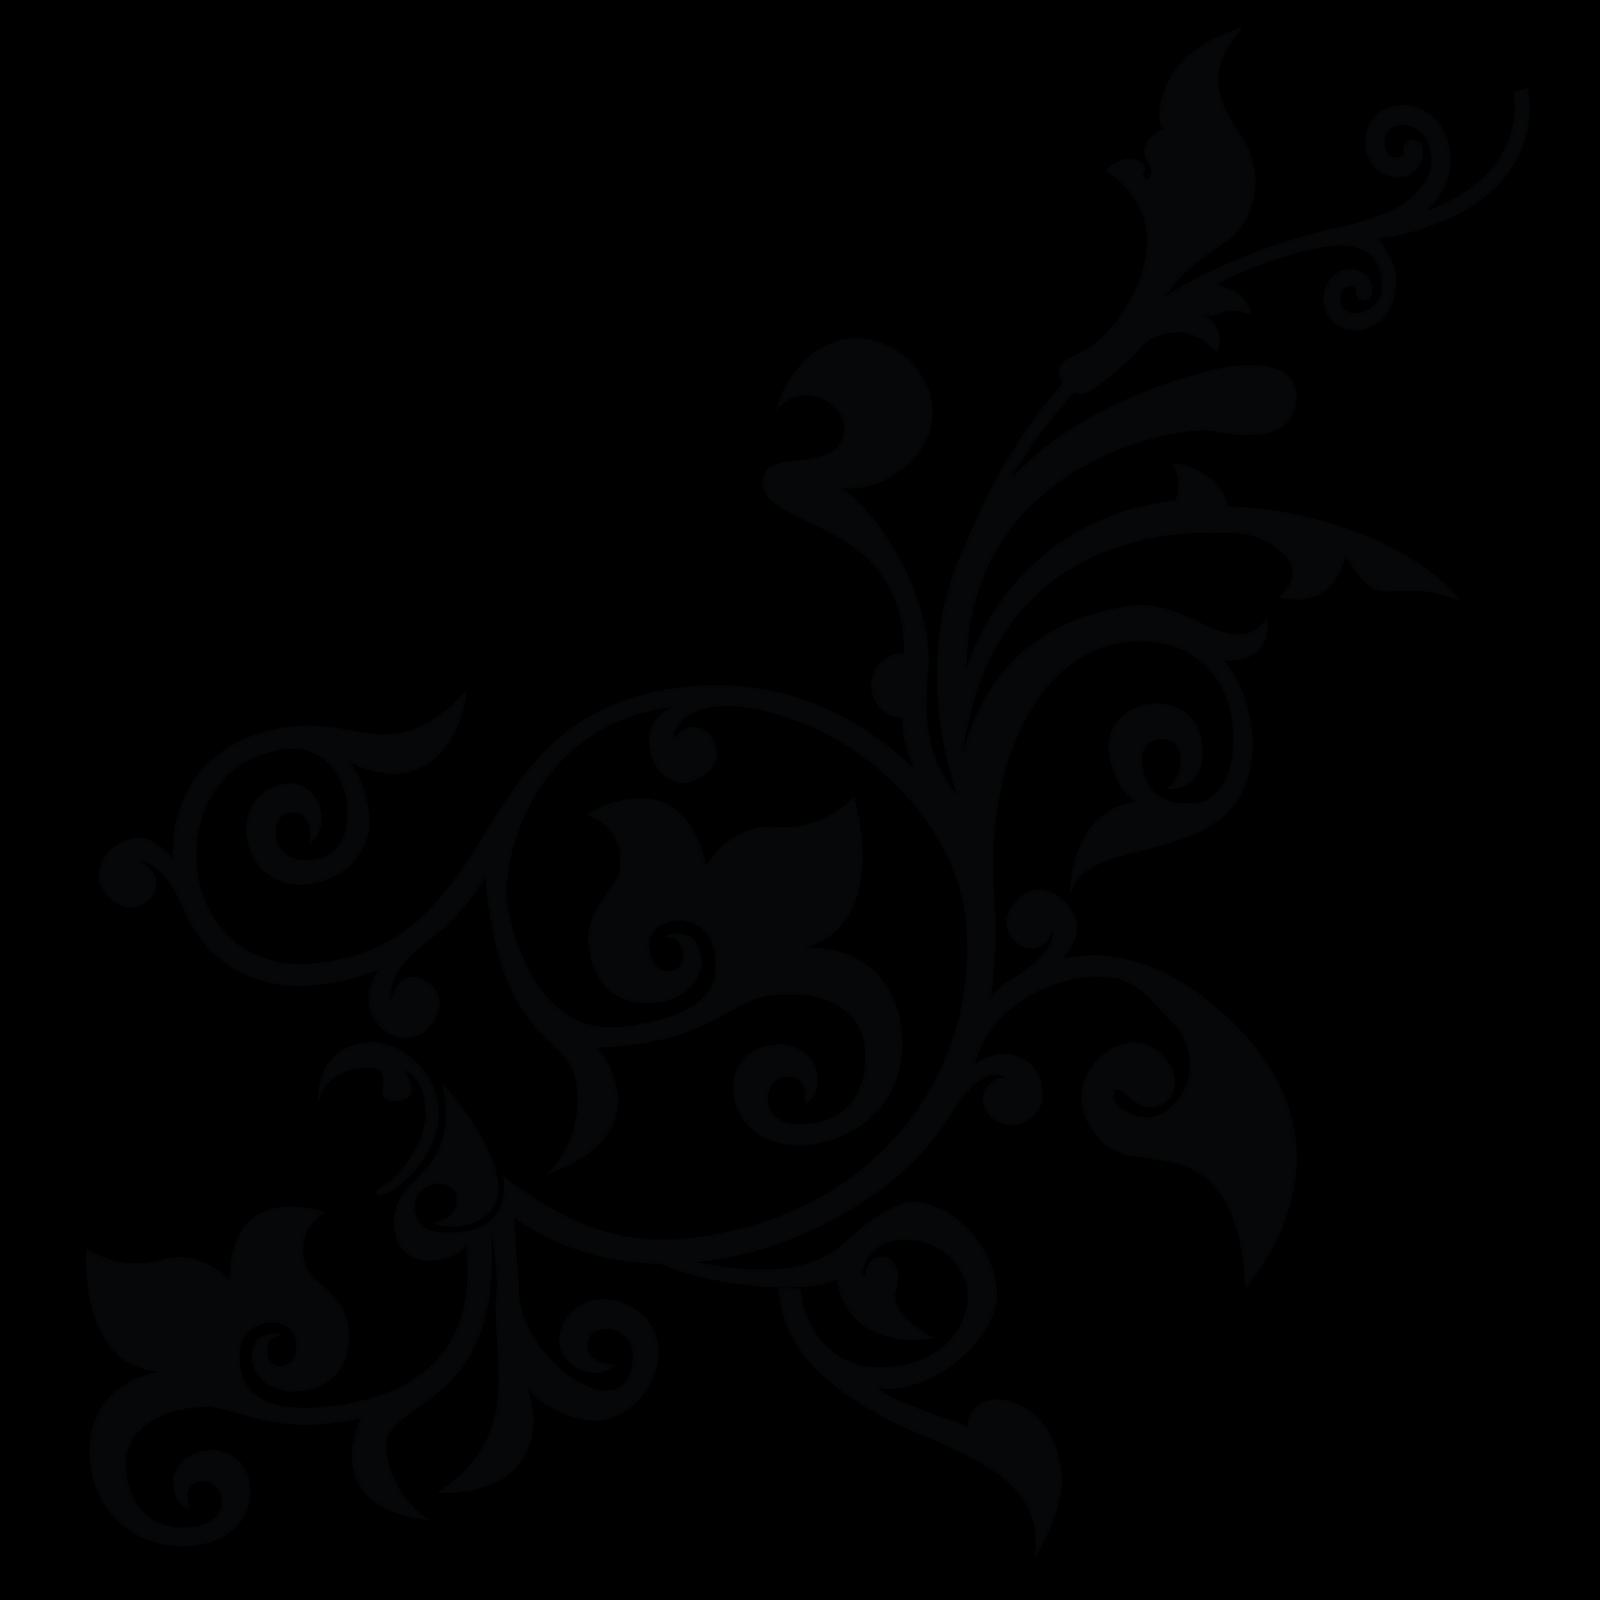 Floral PNG Transparent Floral.PNG Images. | PlusPNG